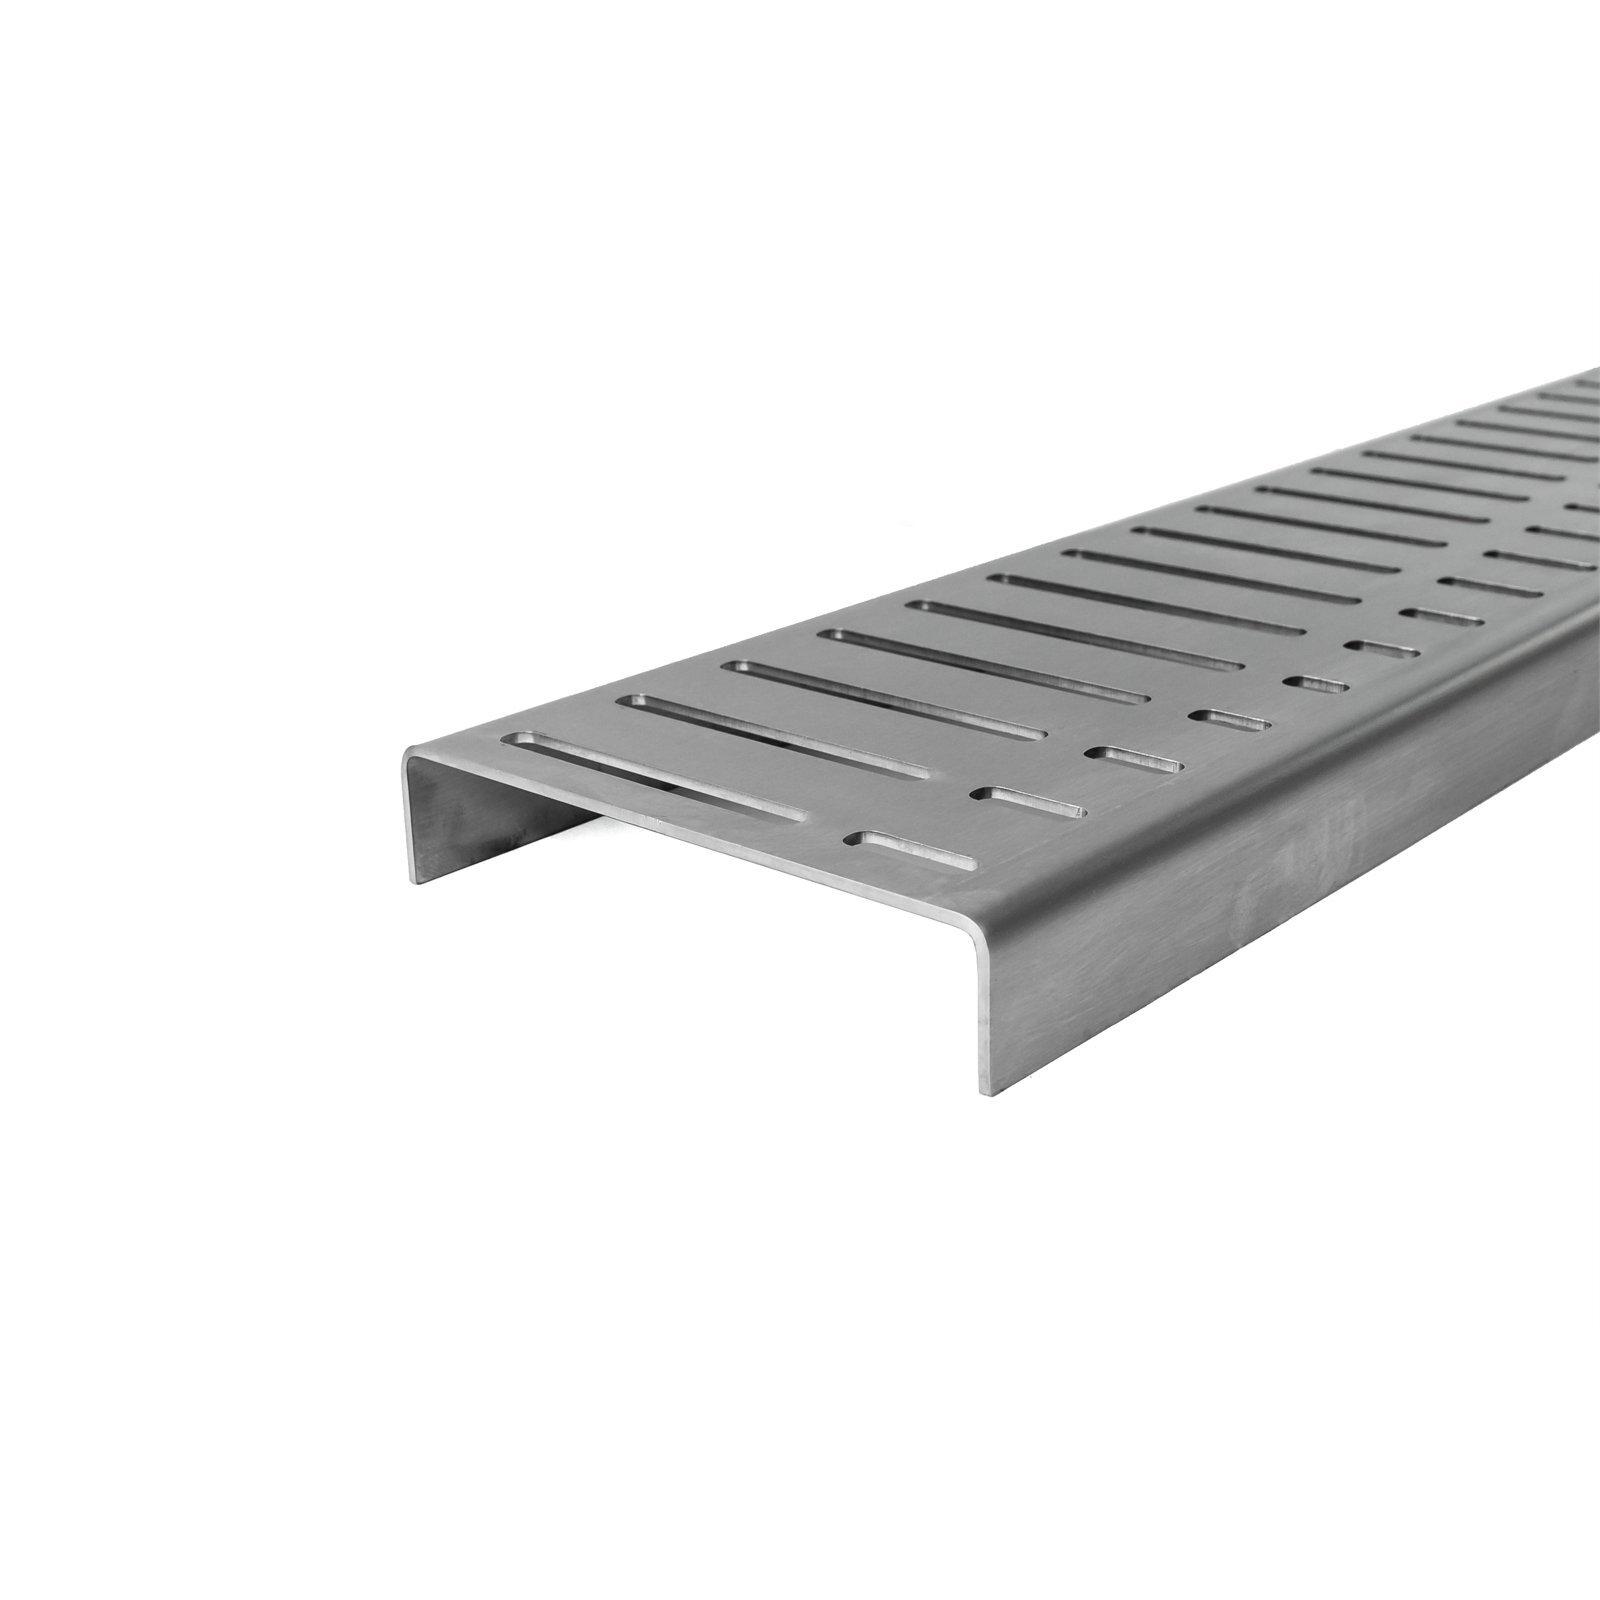 Grates 2 Go 1000mm Flow Pattern Shower Modular - Grate Only